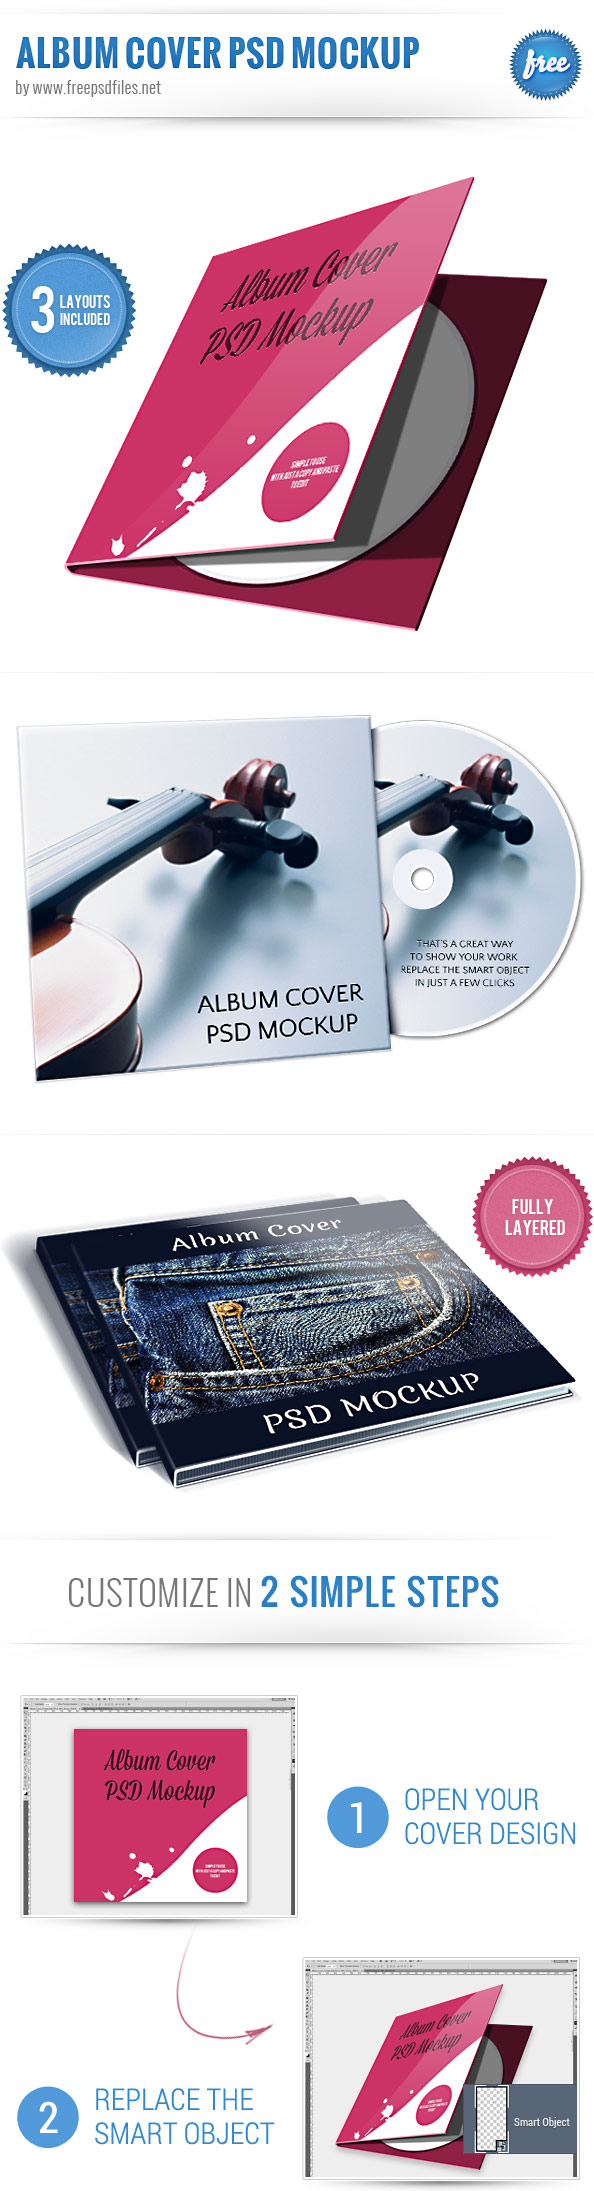 Album Cover PSD Mockup